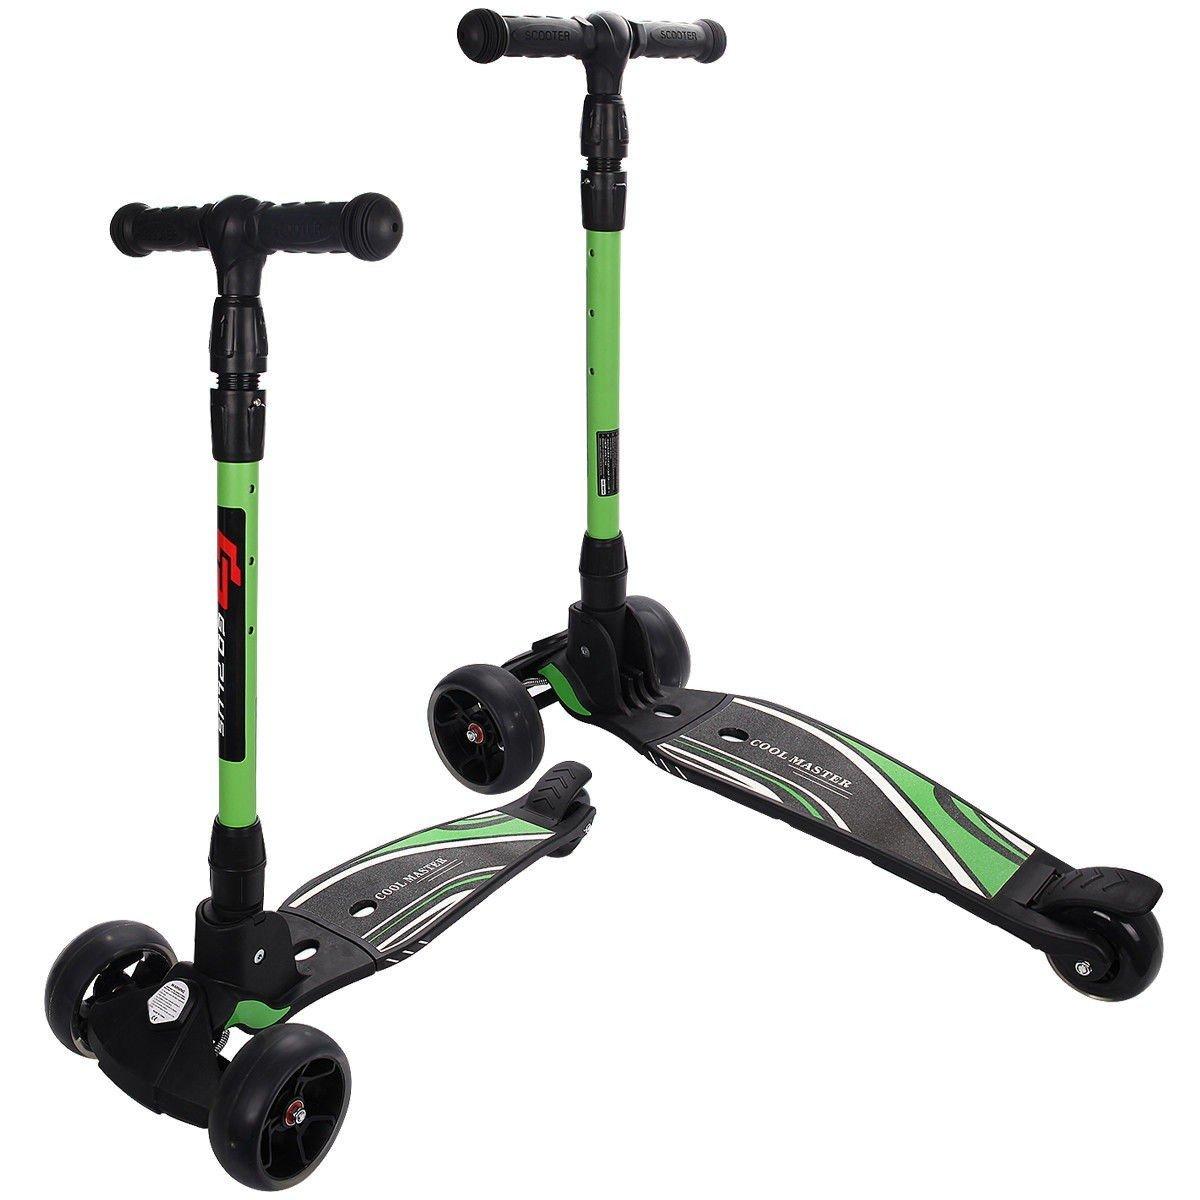 Folding Aluminum Adjustable Height LED 3 Wheels T-Bar Kick Scooter - Green